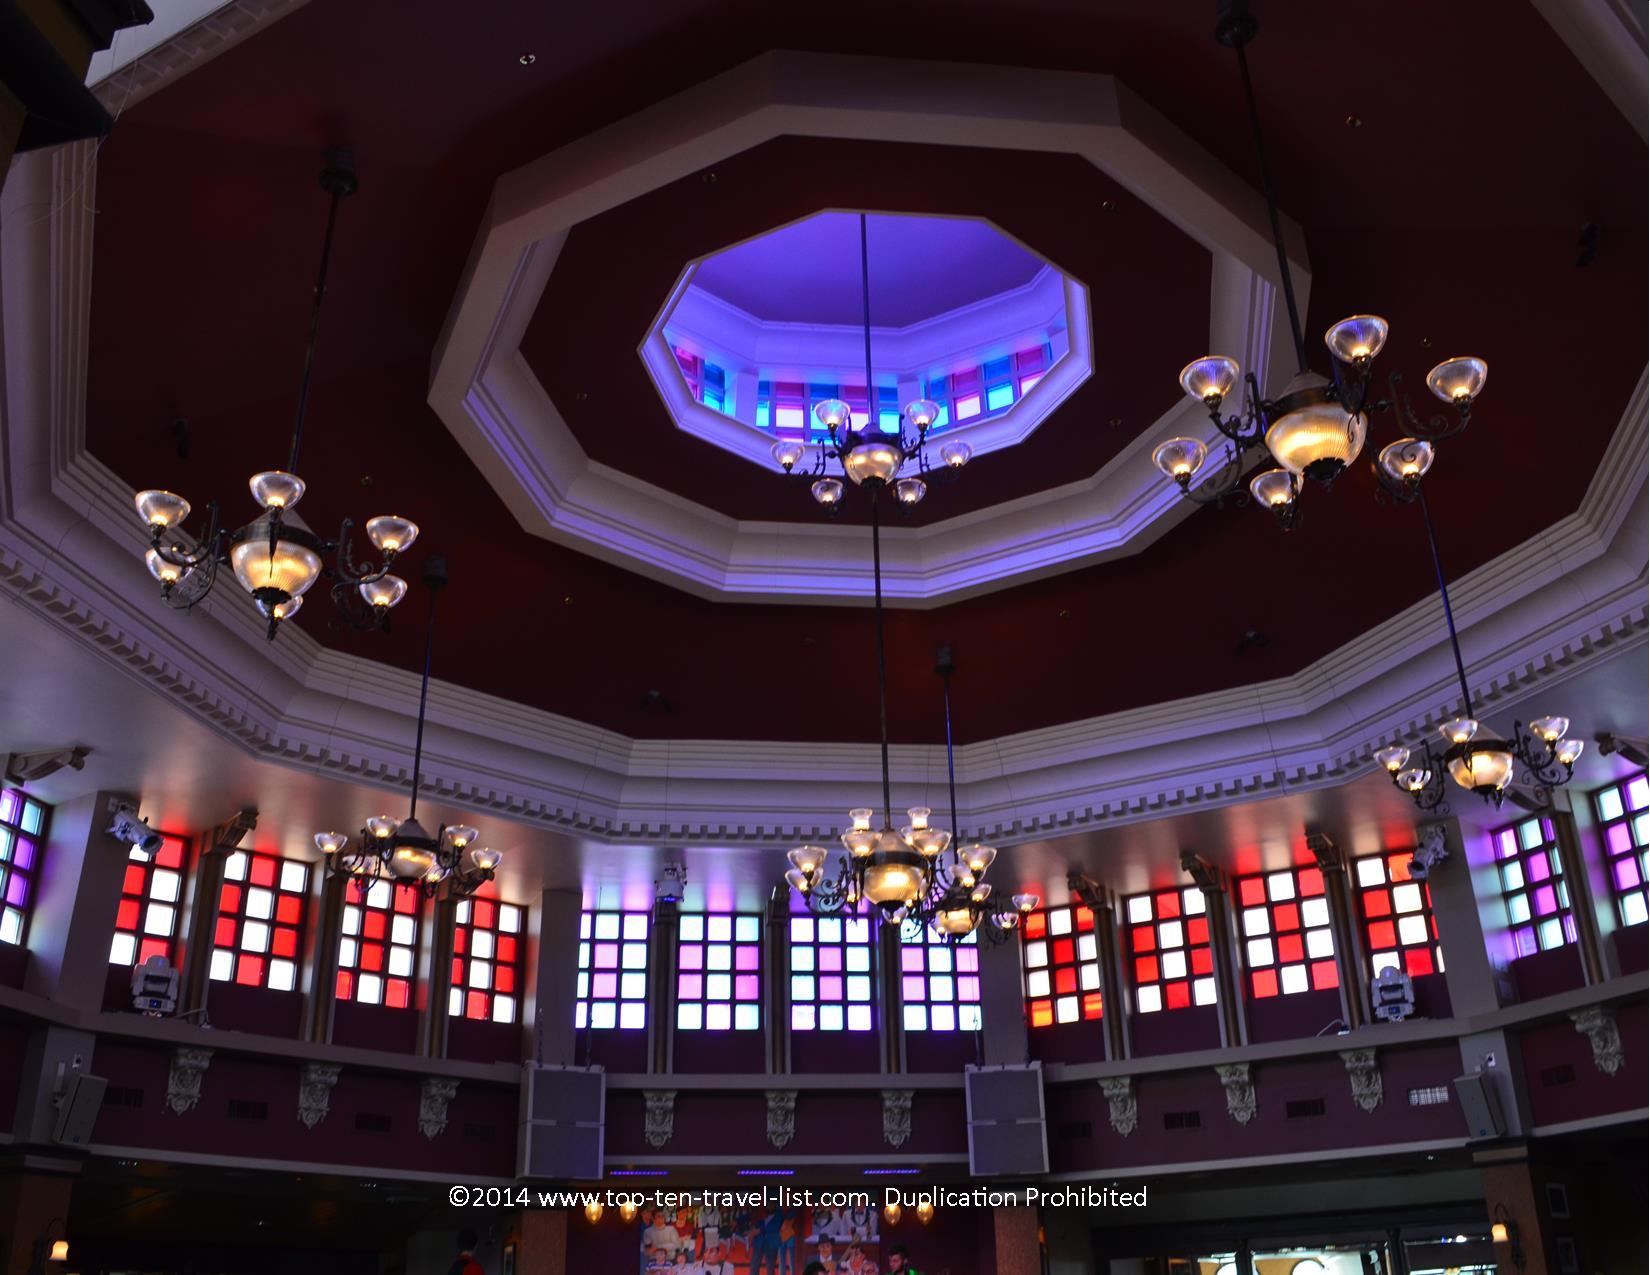 Beautiful domed ceilings of Ragland Road - Downtown Disney in Orlando, Florida